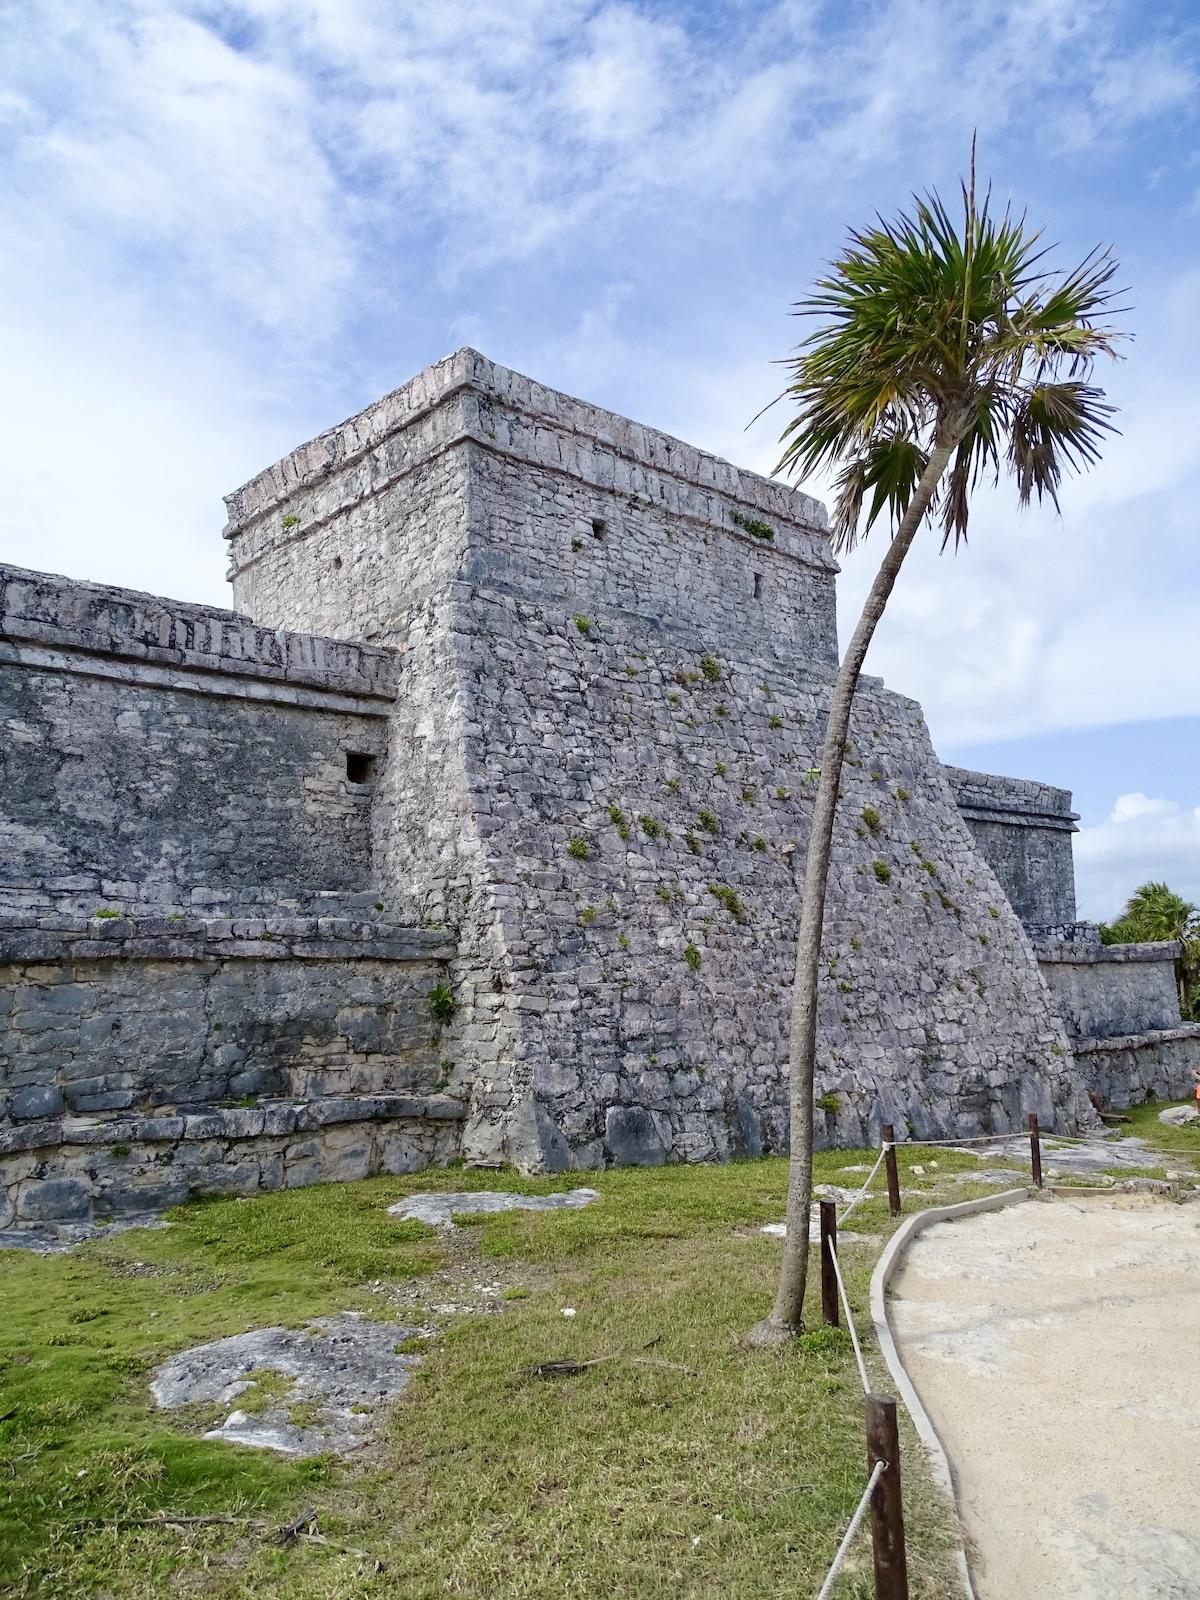 el castillo is part of tulum ruins